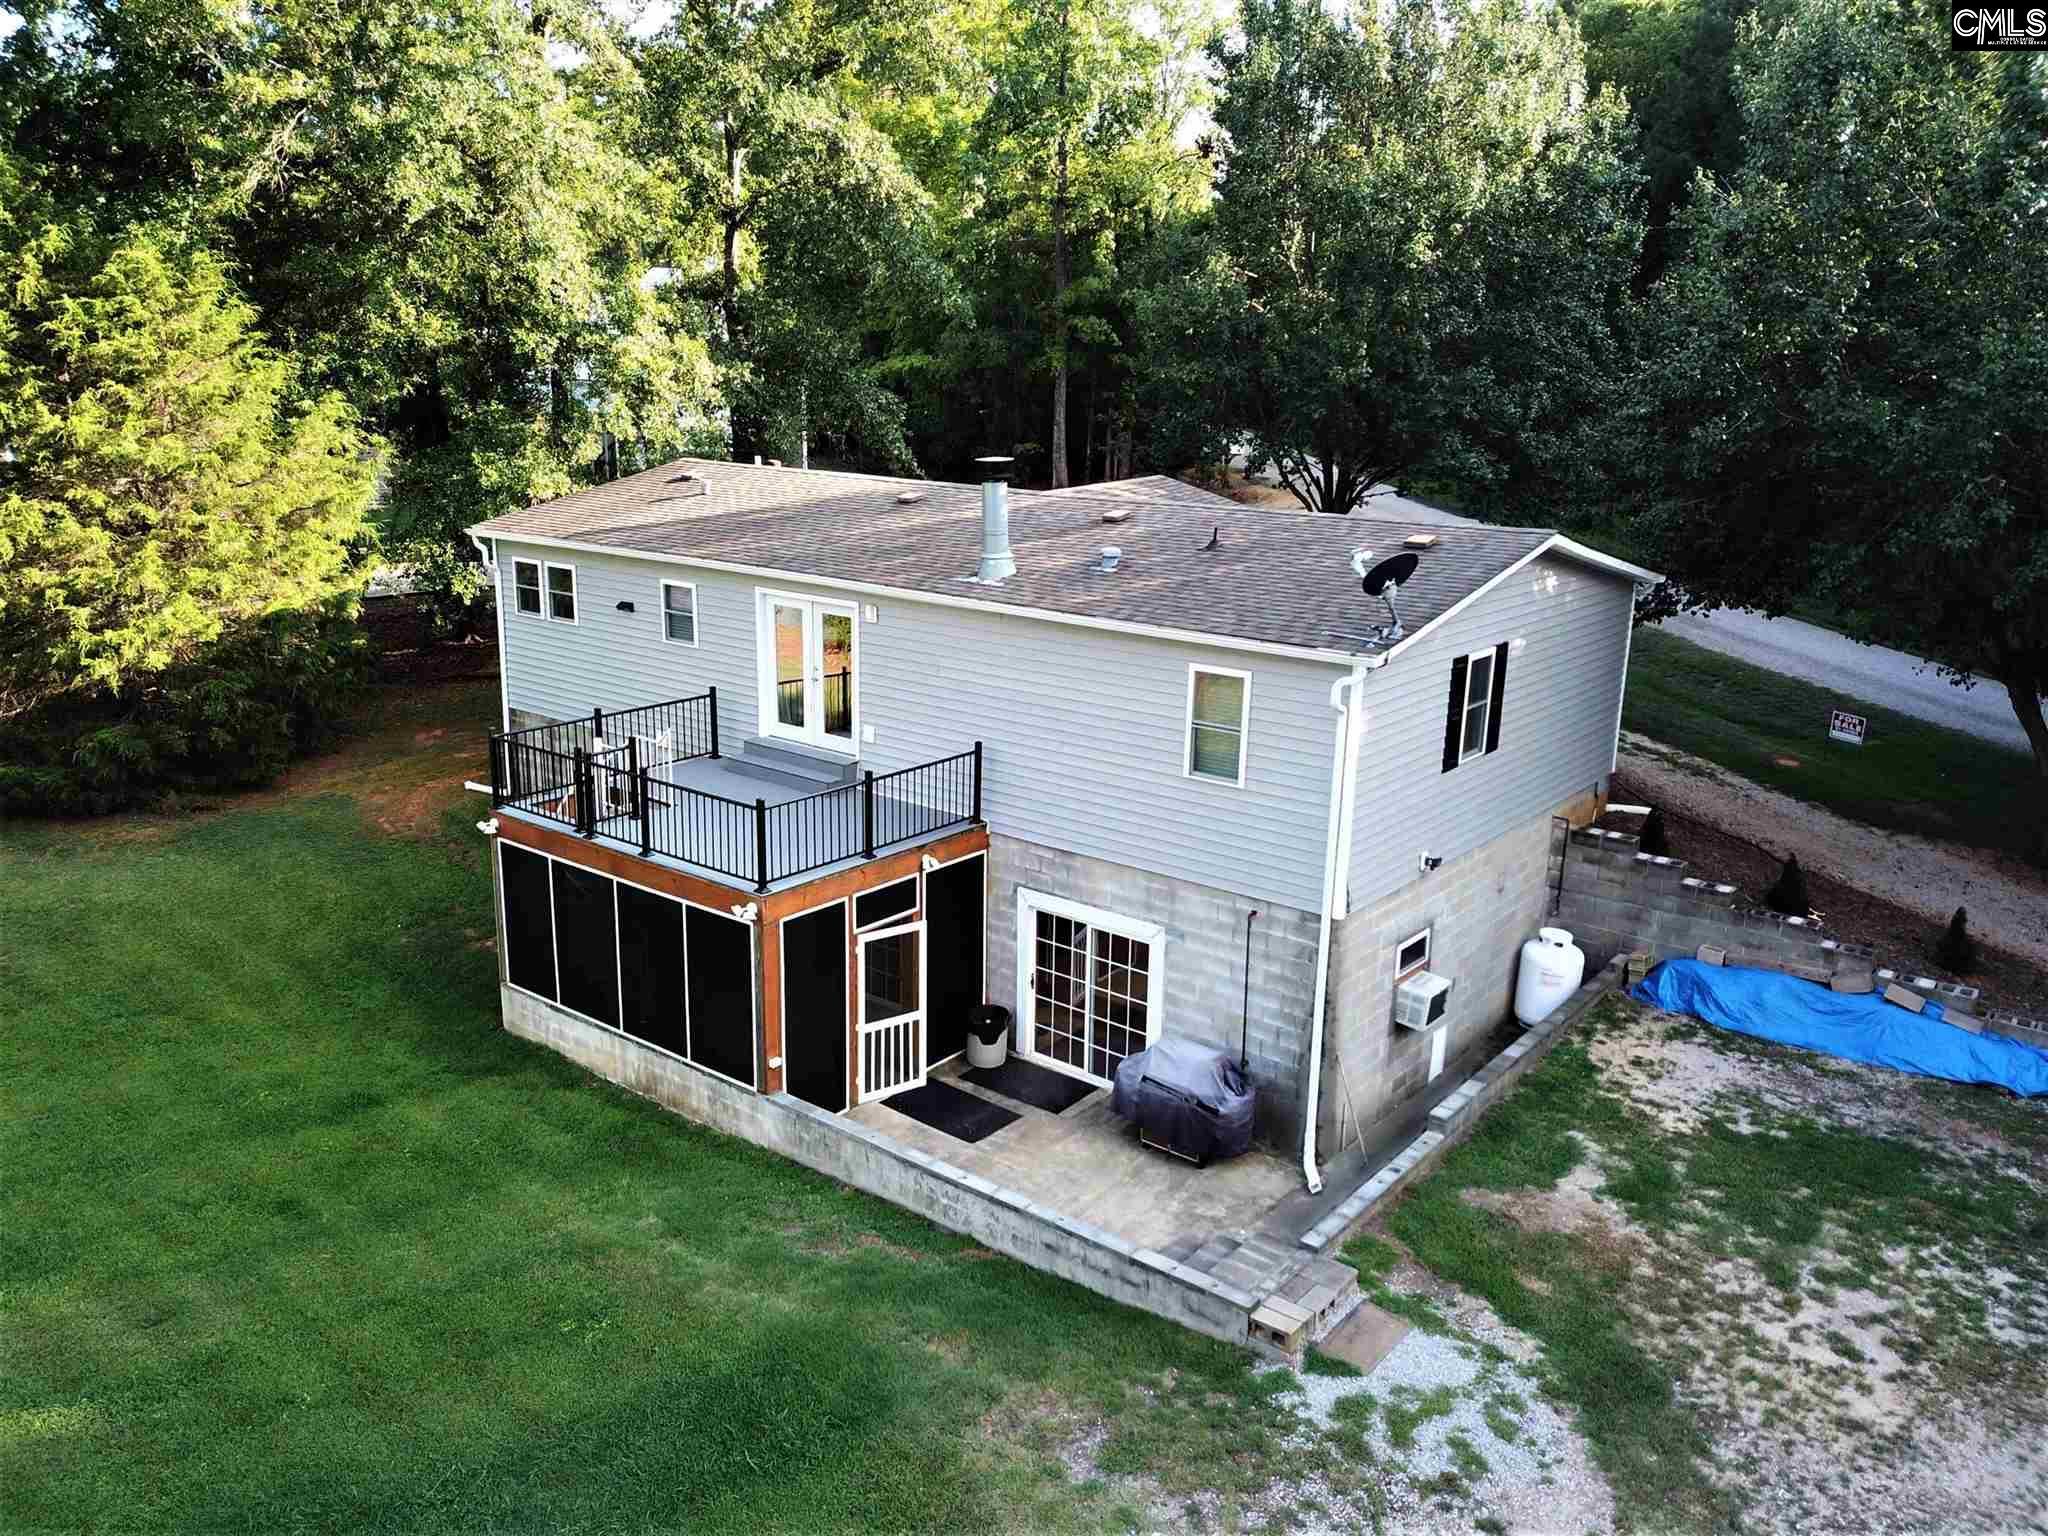 2321 Great North Winnsboro, SC 29180-6950